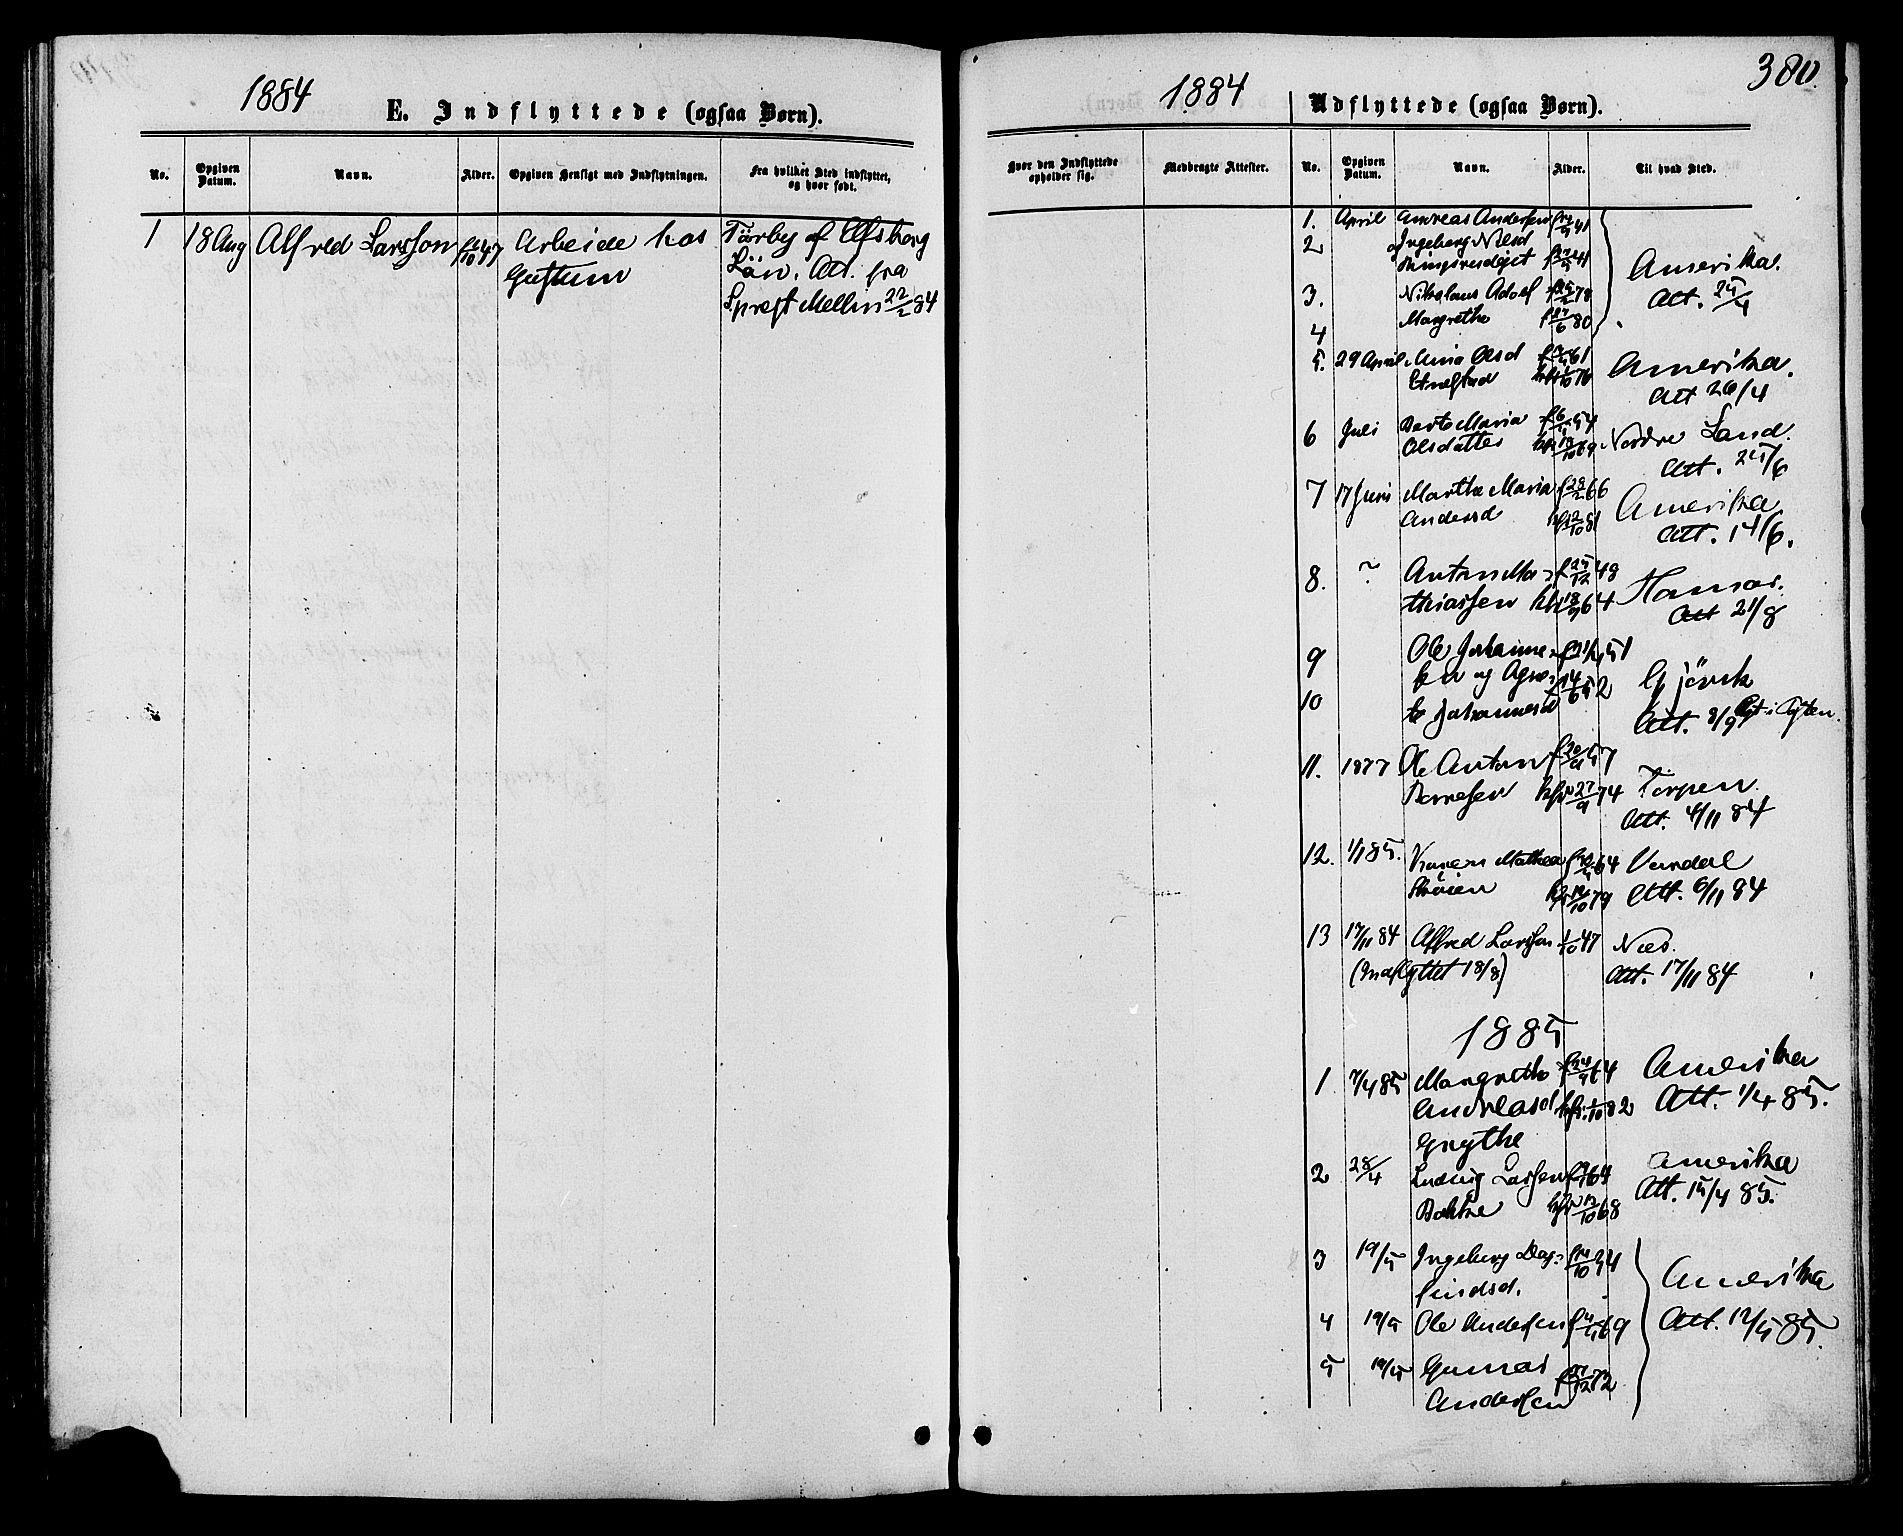 SAH, Biri prestekontor, Ministerialbok nr. 6, 1877-1886, s. 380